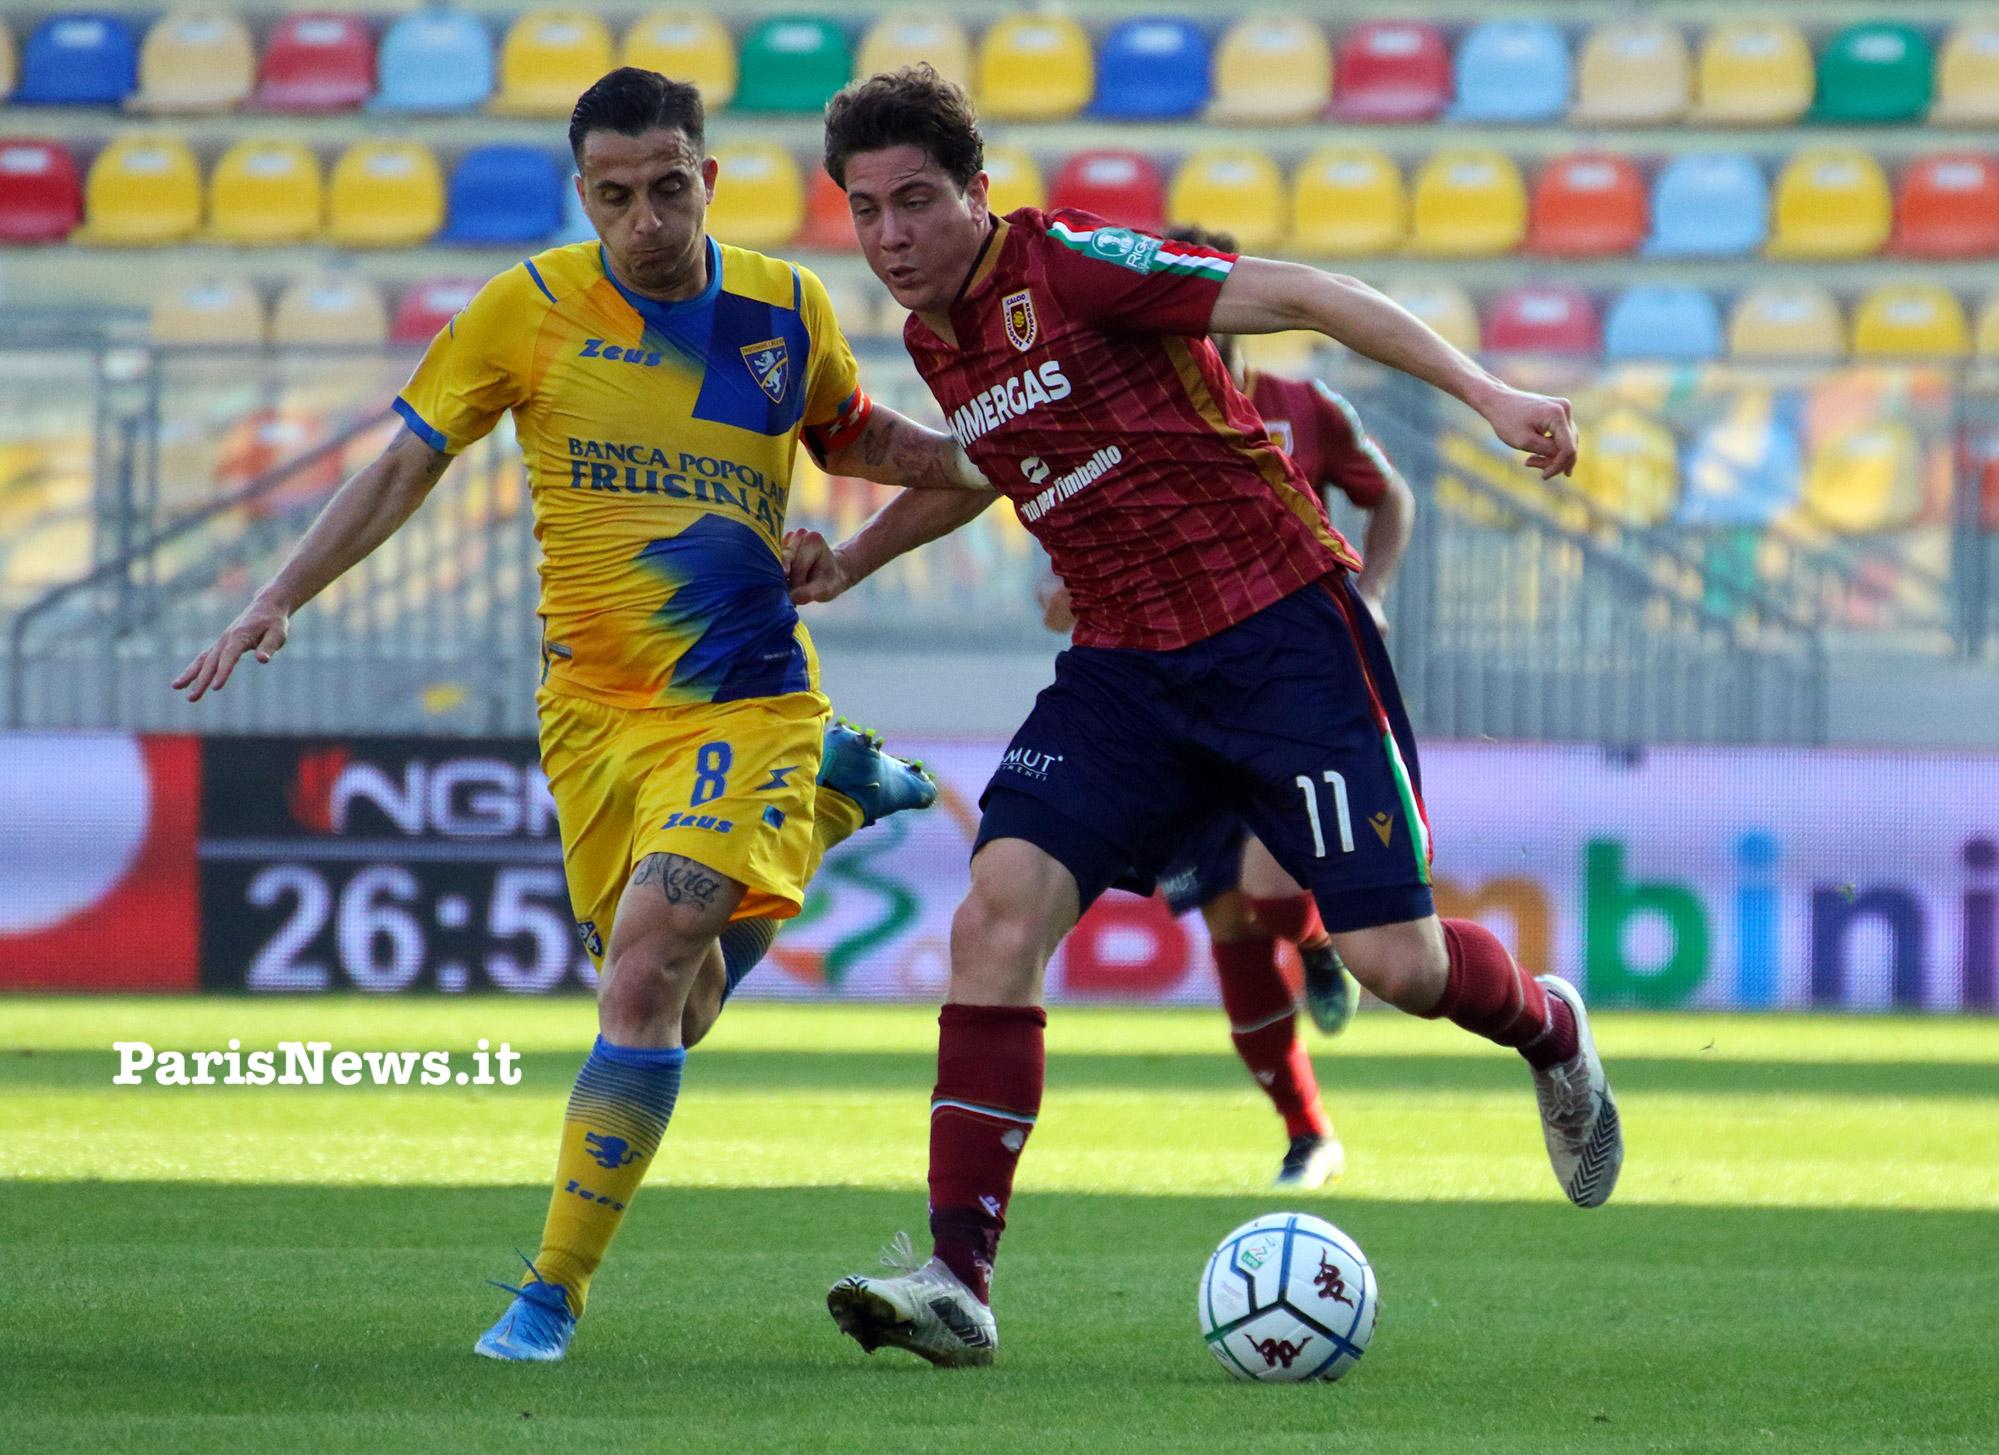 Frosinone - Reggiana 0-0